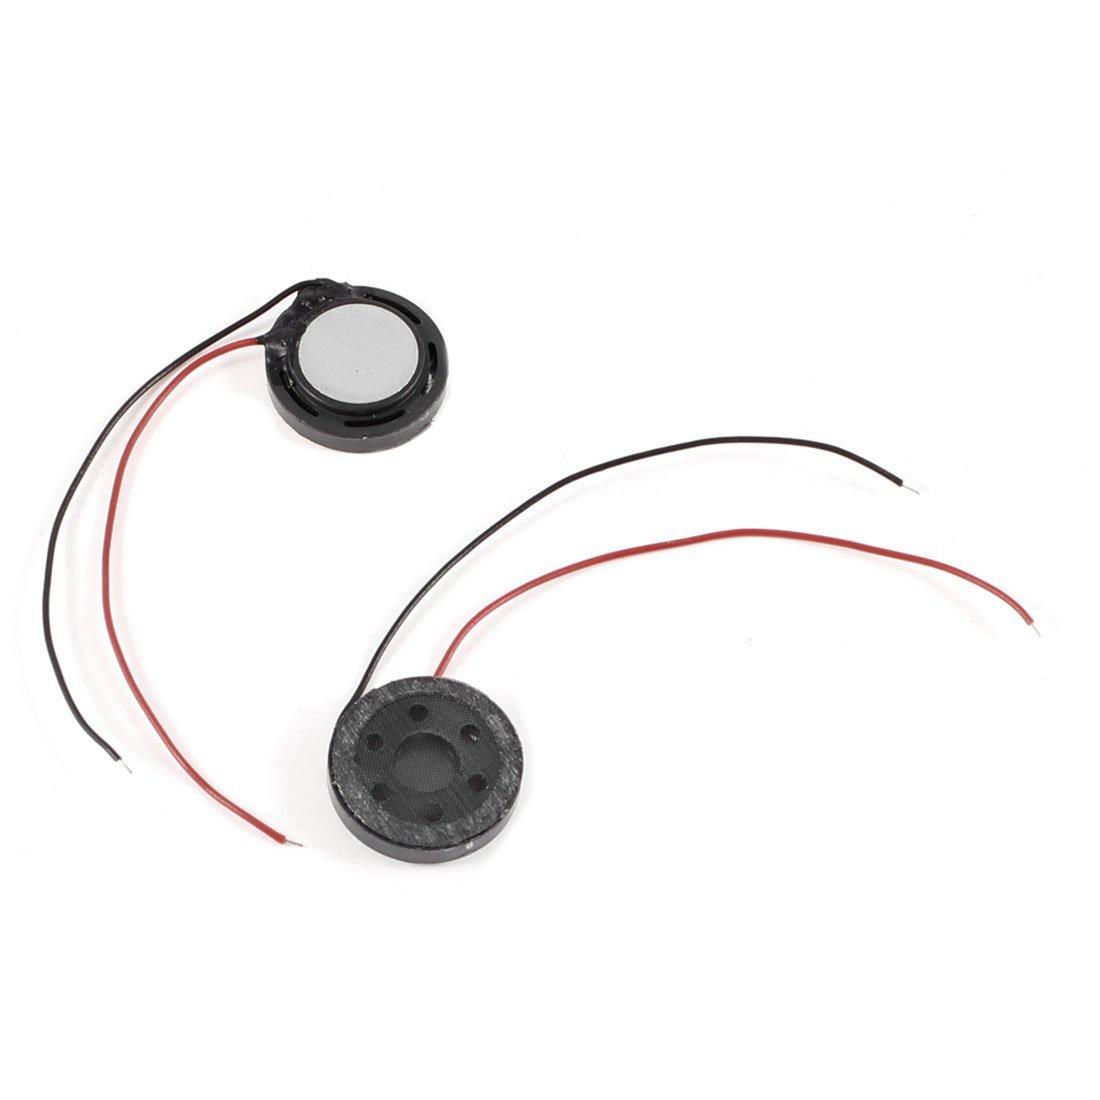 2 Pcs 15mm Round Magnet Magnetic Tweeter Speaker Horn 8 Ohm 1W